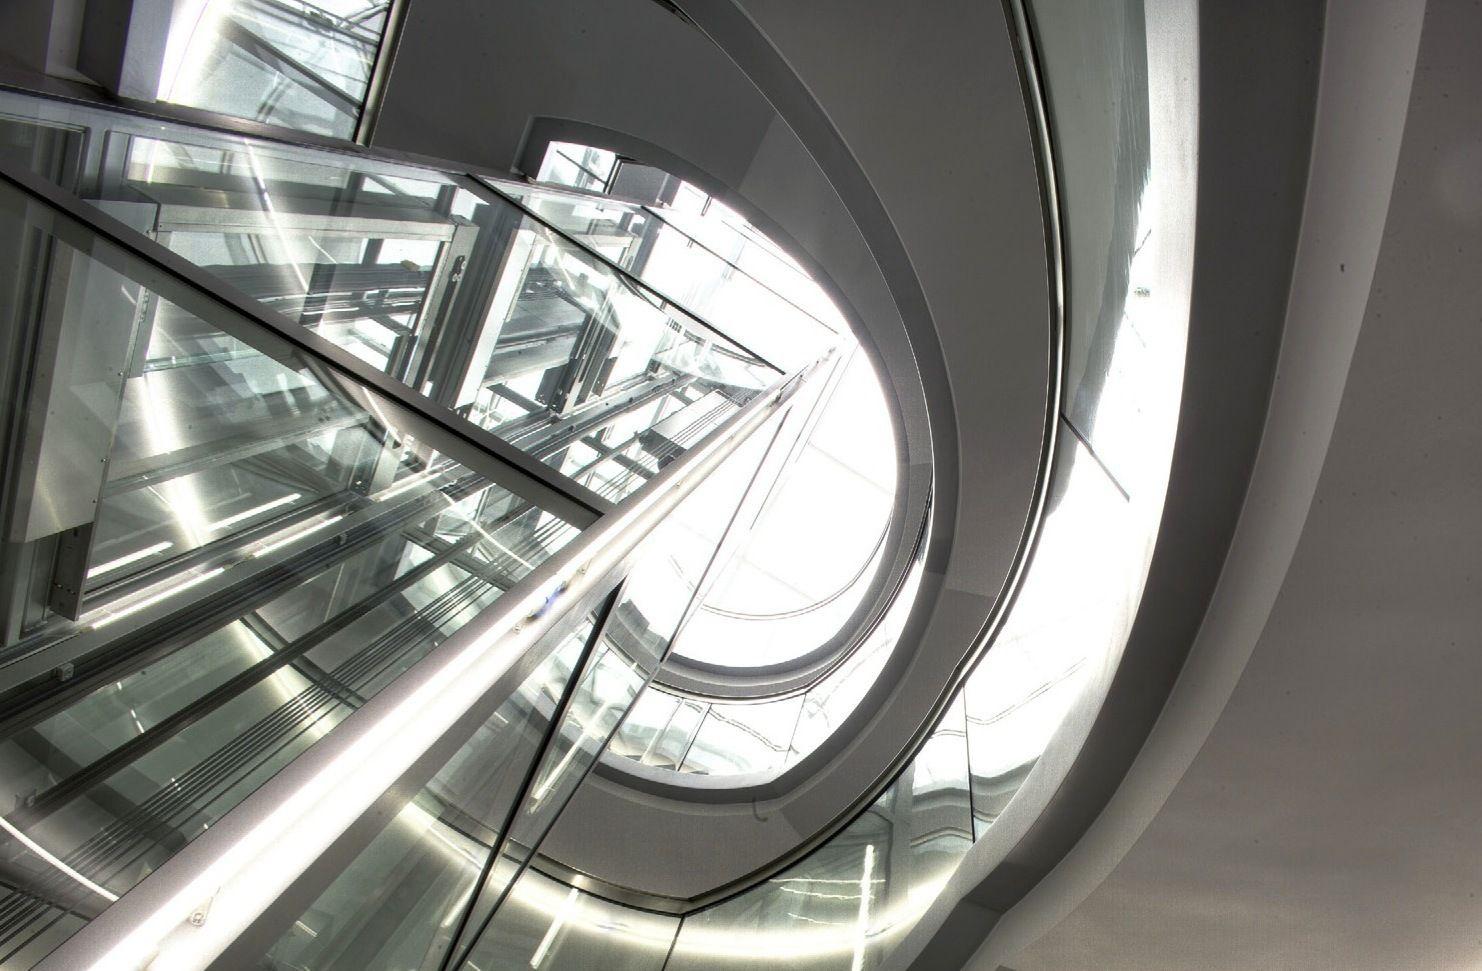 Edifício de Escritórios / Allmann Sattler Wappner Architekten © Günther Wett / FRENER & REIFER Metallbau